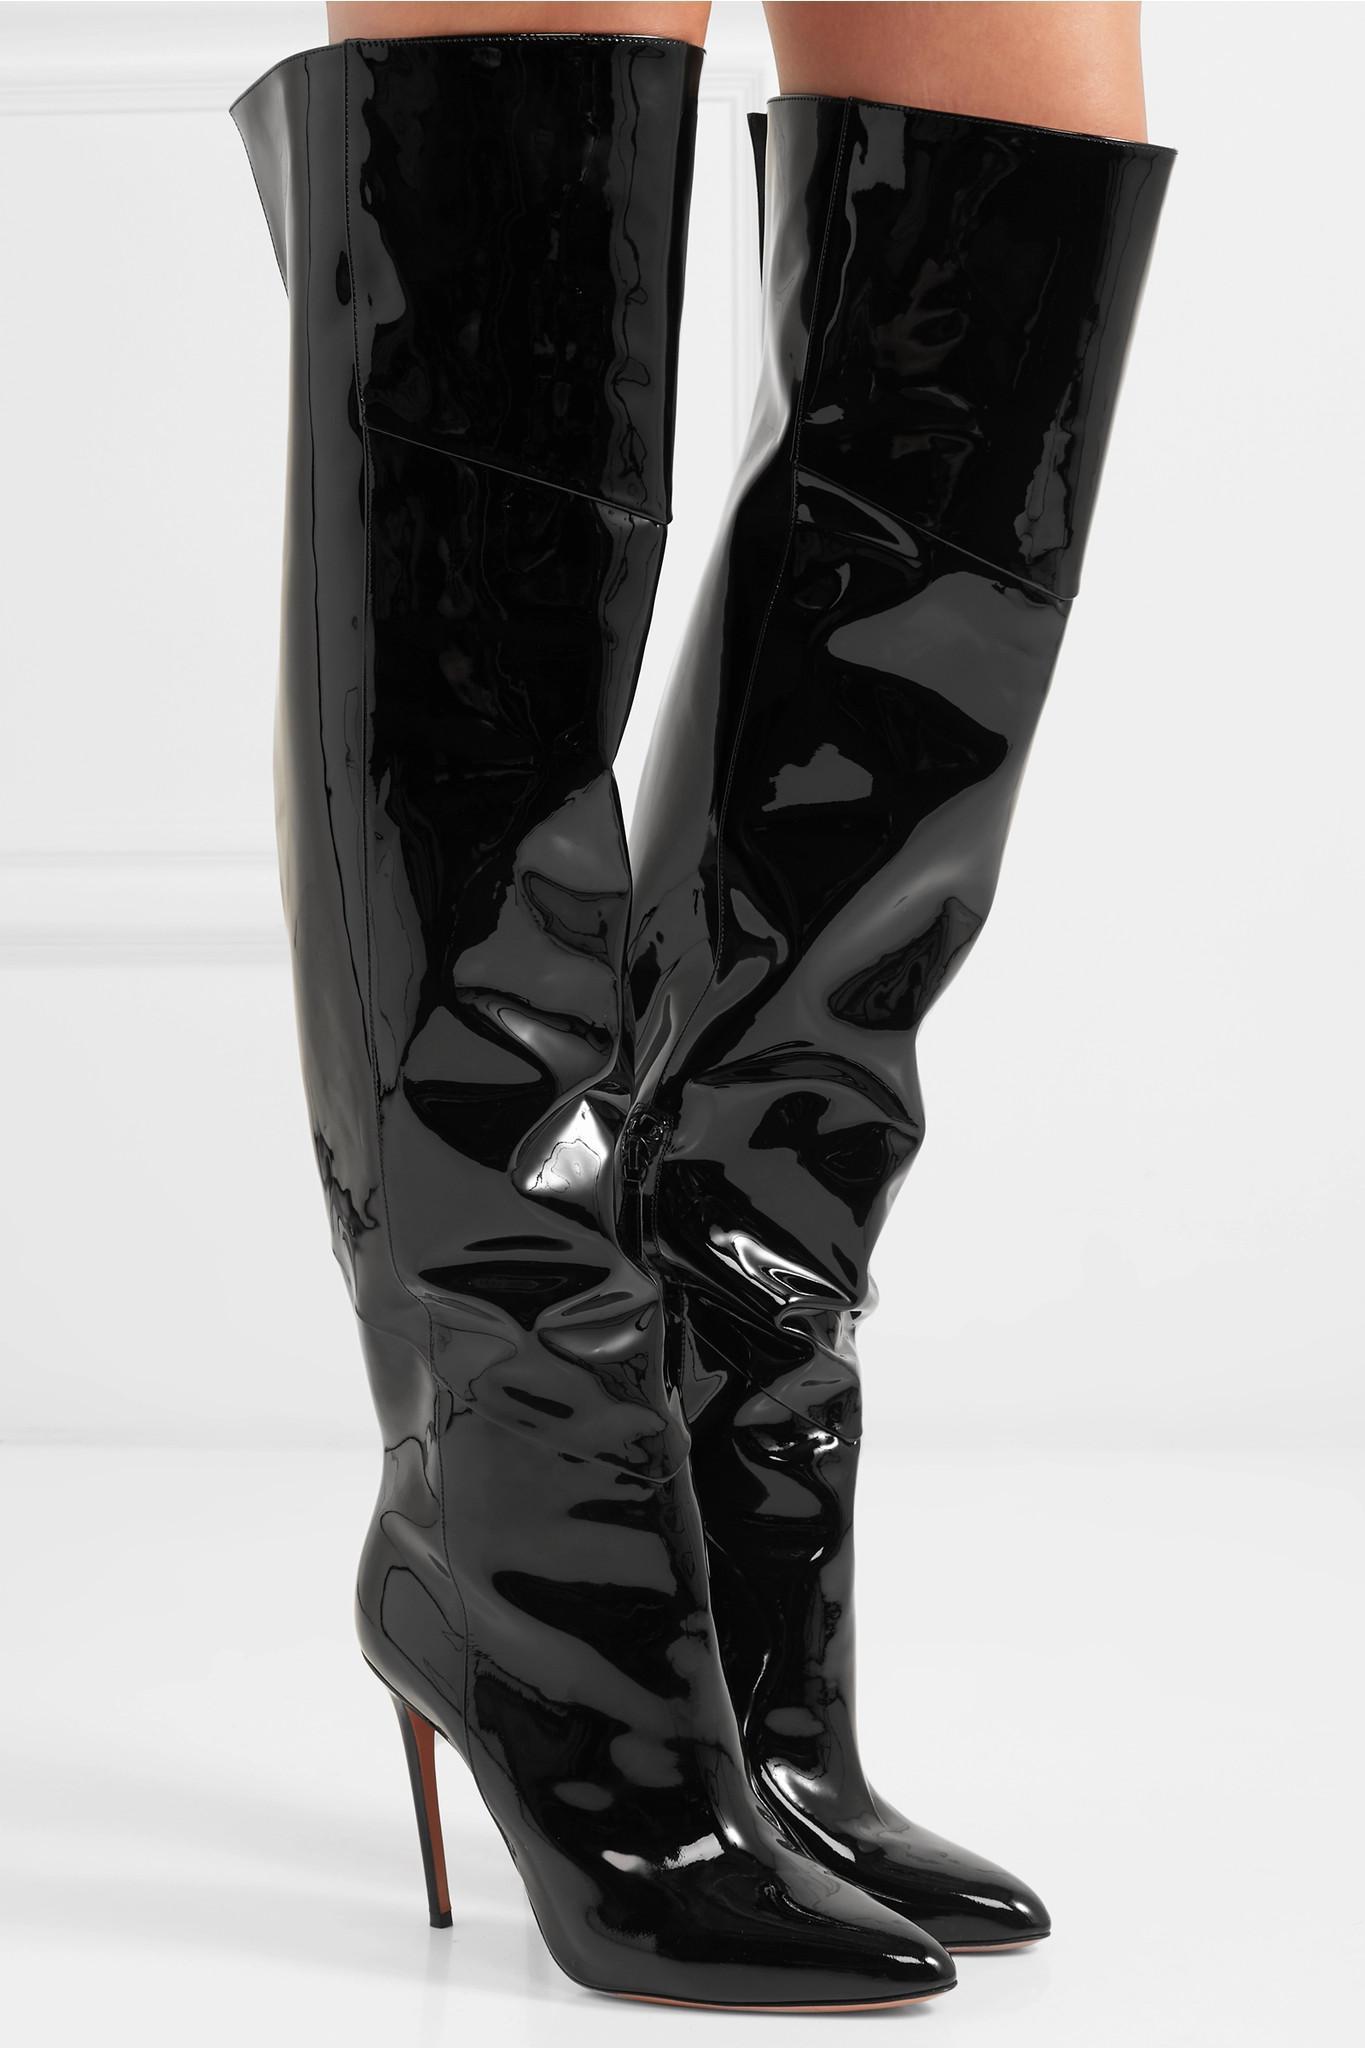 918aa14eb5b Aquazzura - Black Alma 105 Patent-leather Over-the-knee Boots - Lyst. View  fullscreen